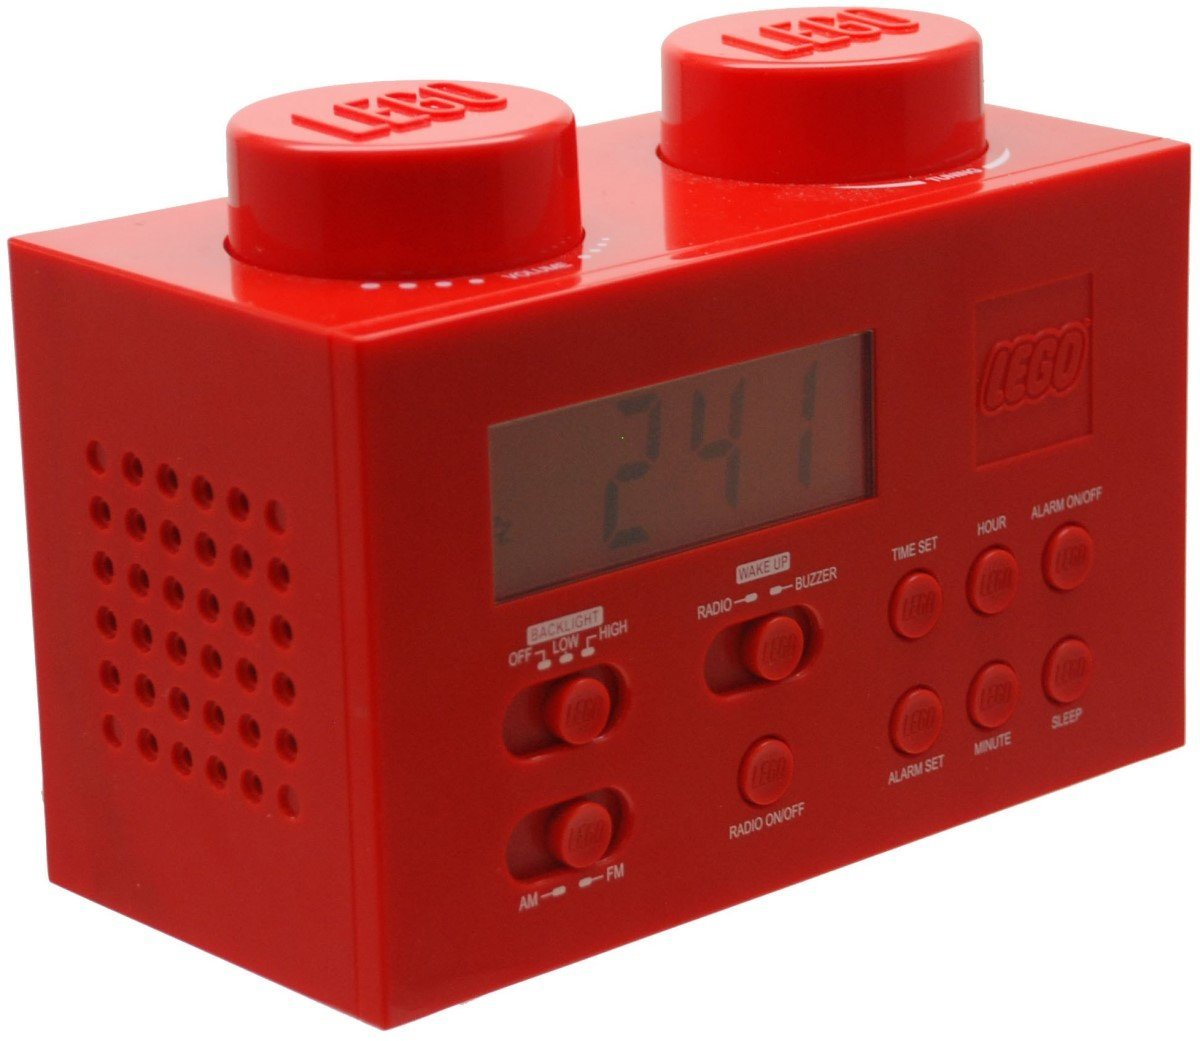 Cheap Icraig Alarm Clock Radio Instructions Find Icraig Alarm Clock